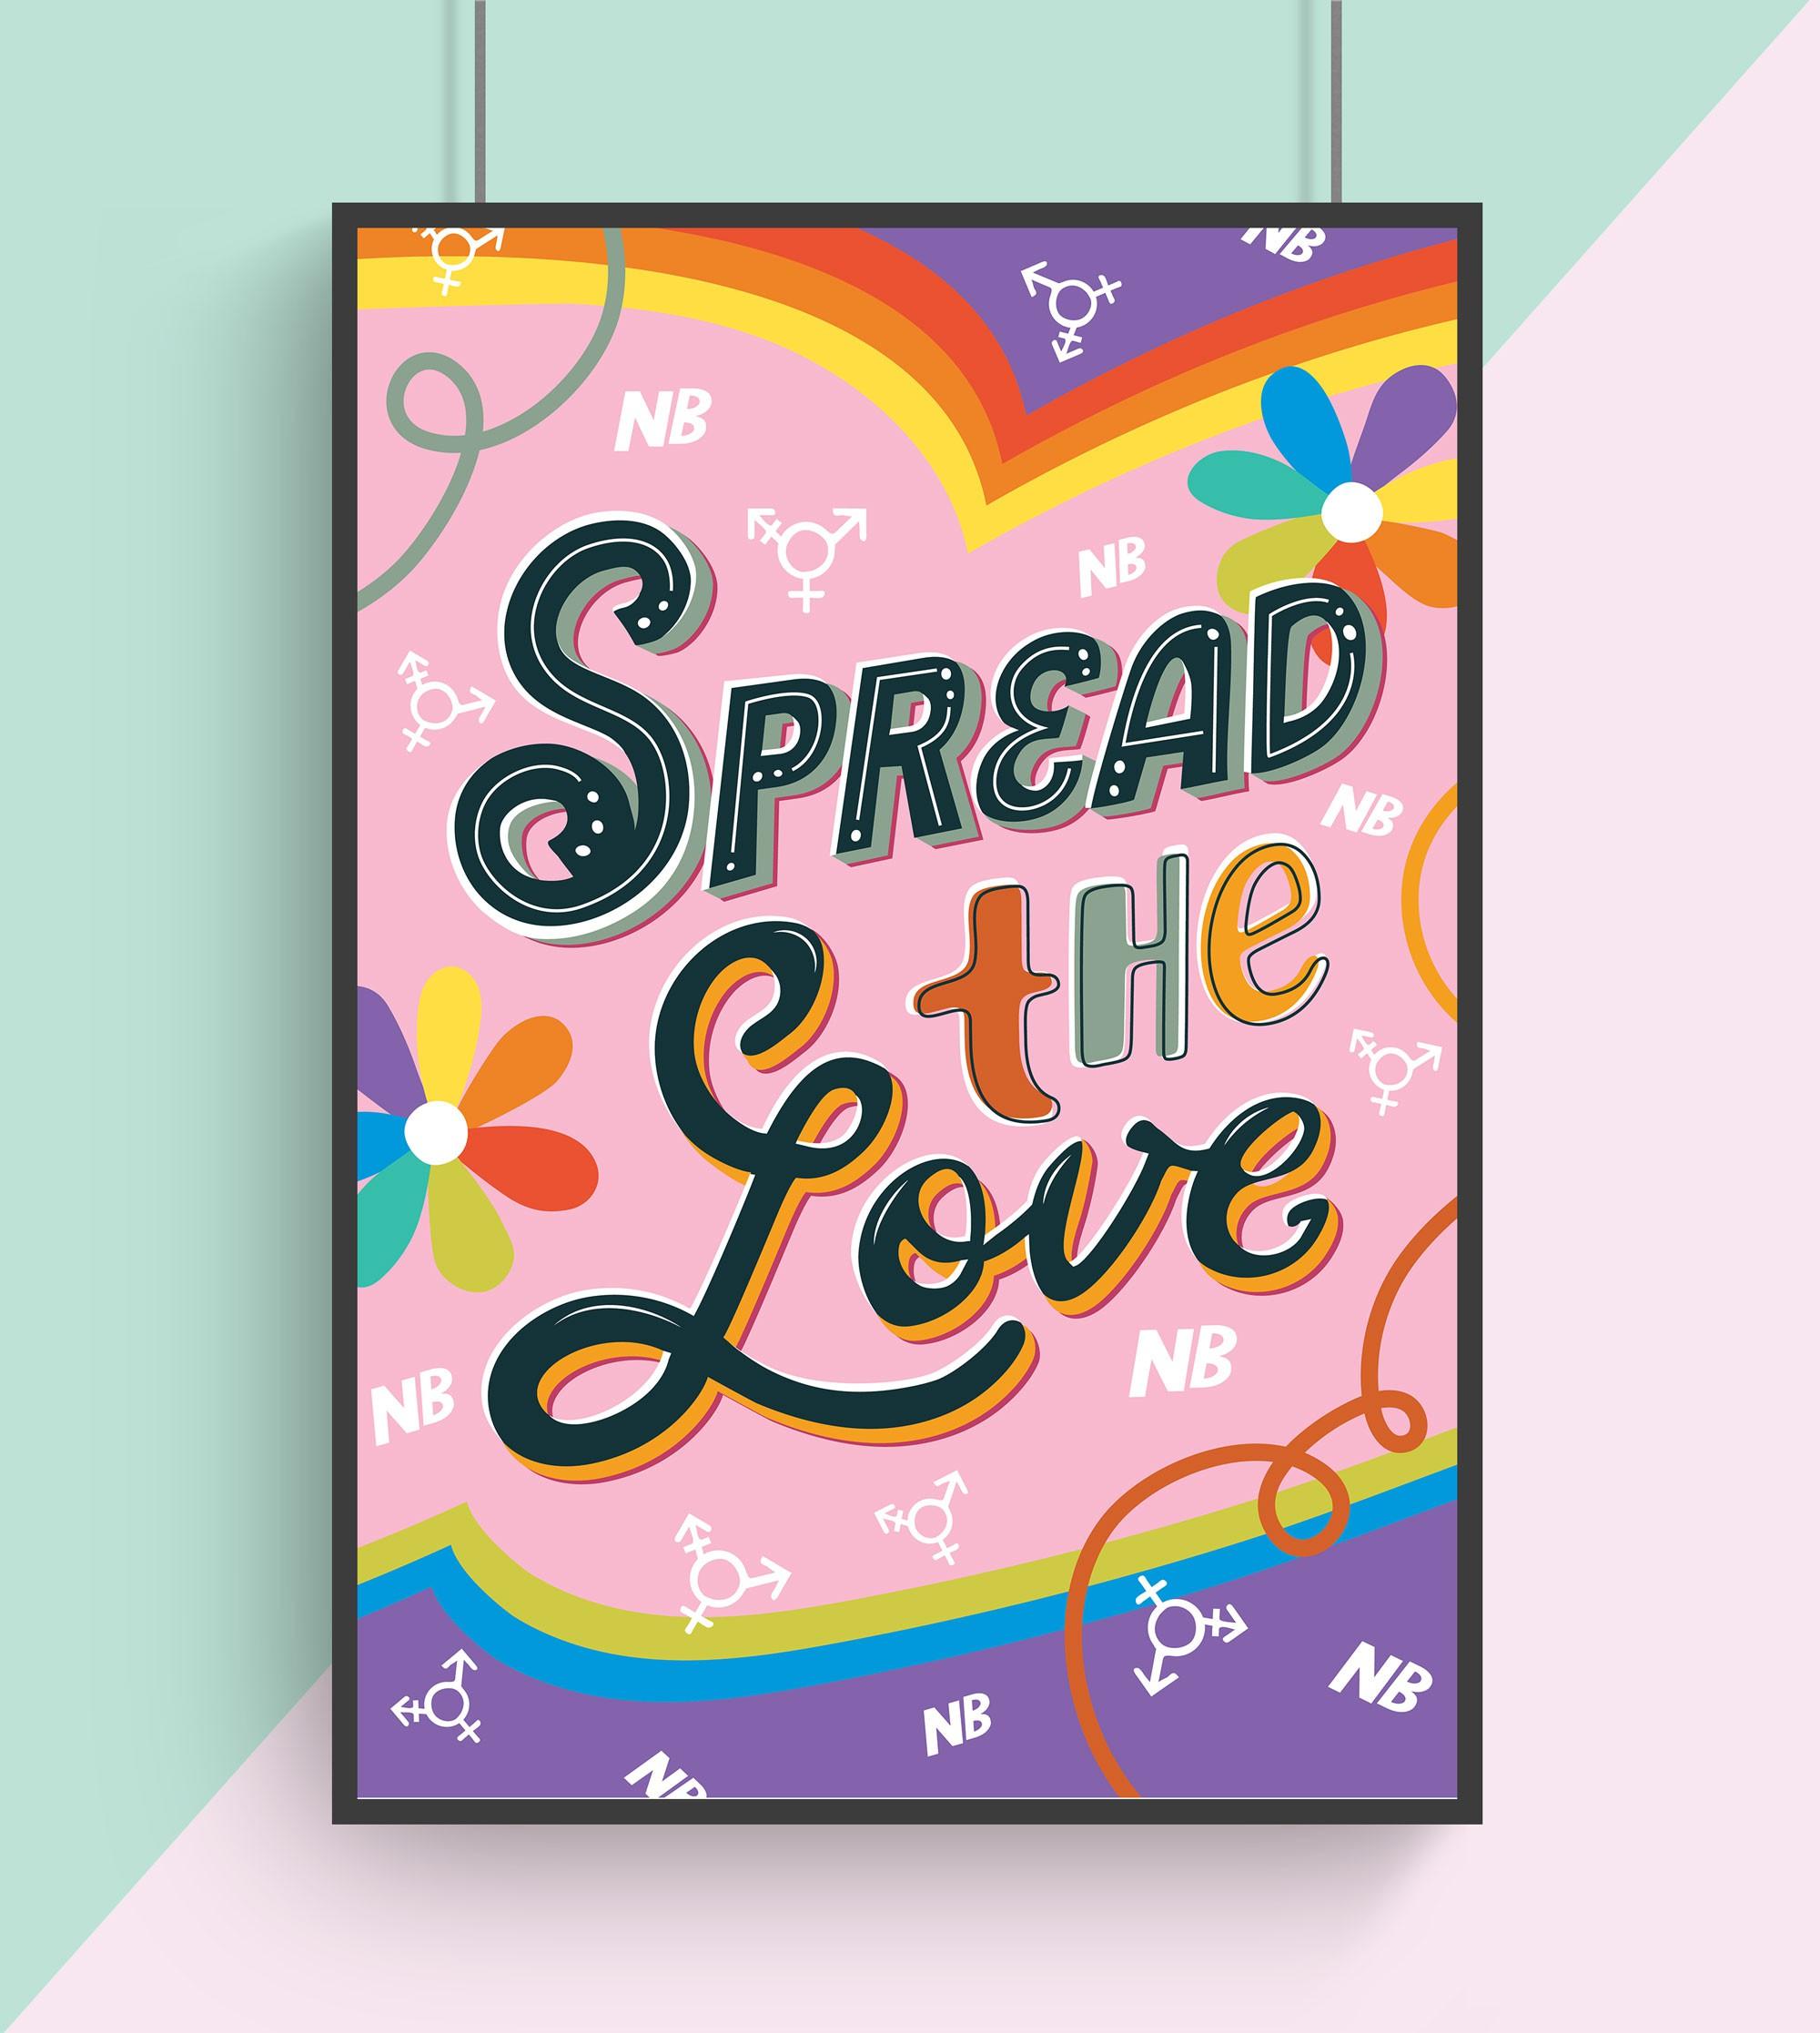 Poster art for a new social media platform